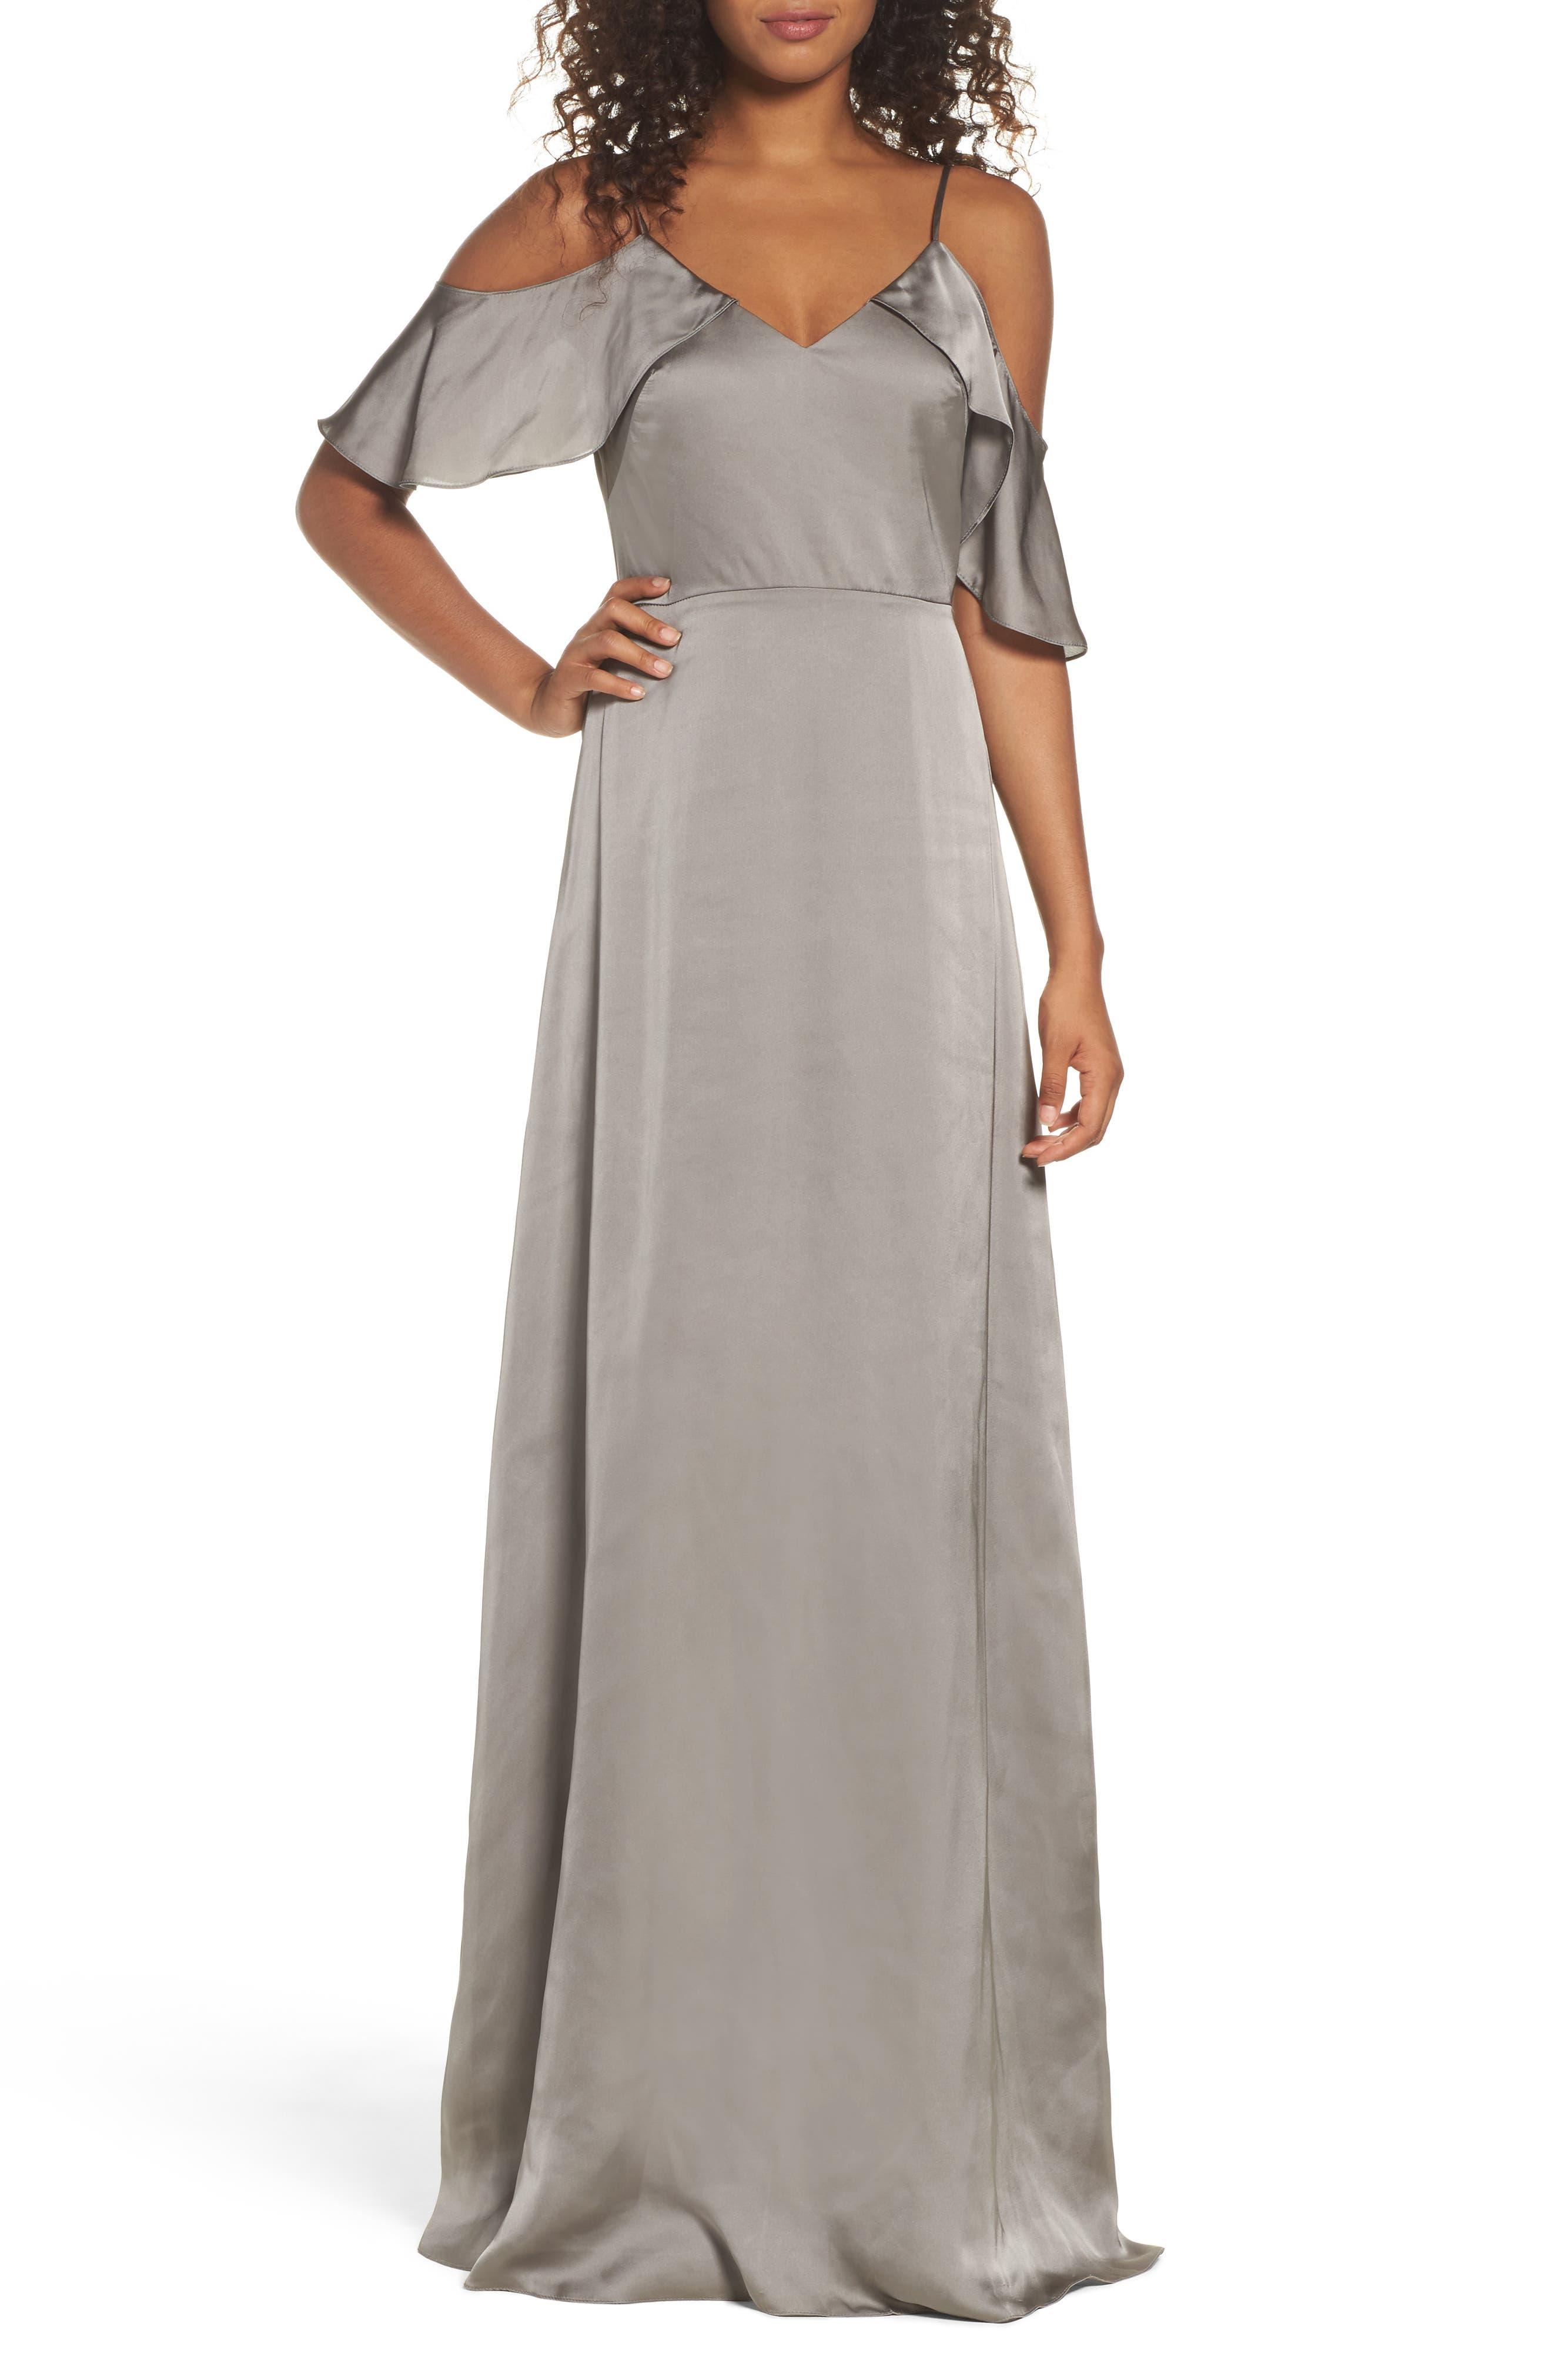 Monique Lhuillier Bridesmaids Isabel Sateen Cold Shoulder Gown (Nordstrom Exclusive)